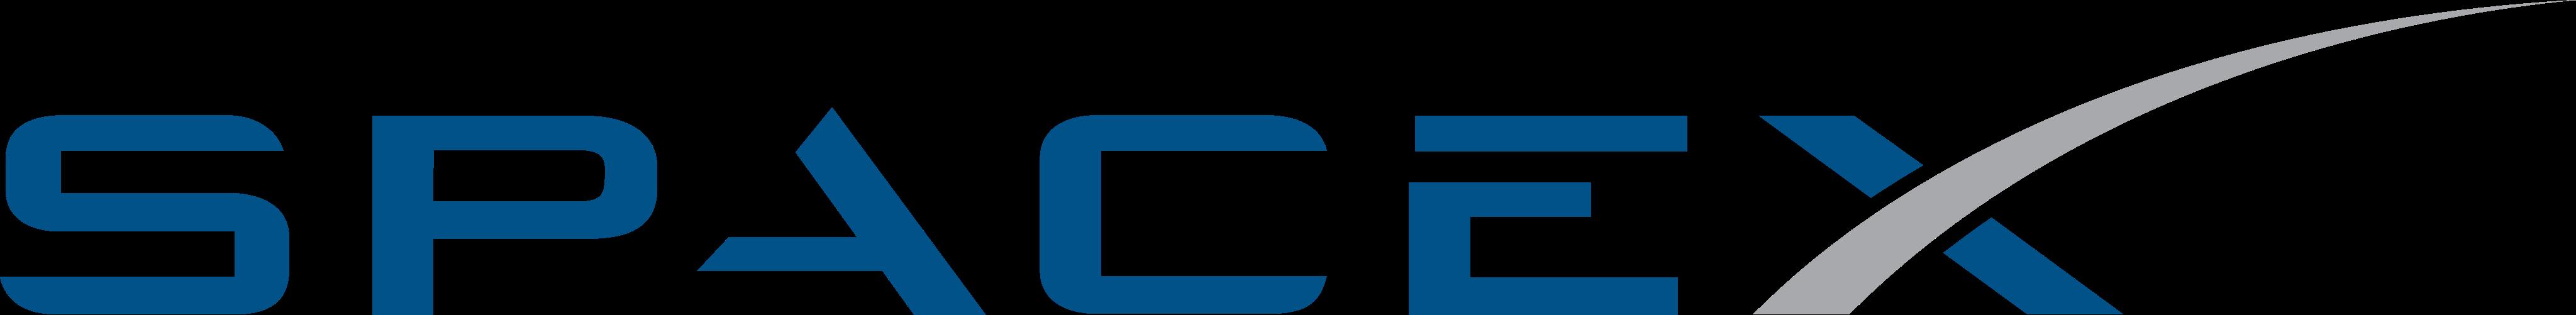 spacex logo - SpaceX Logo